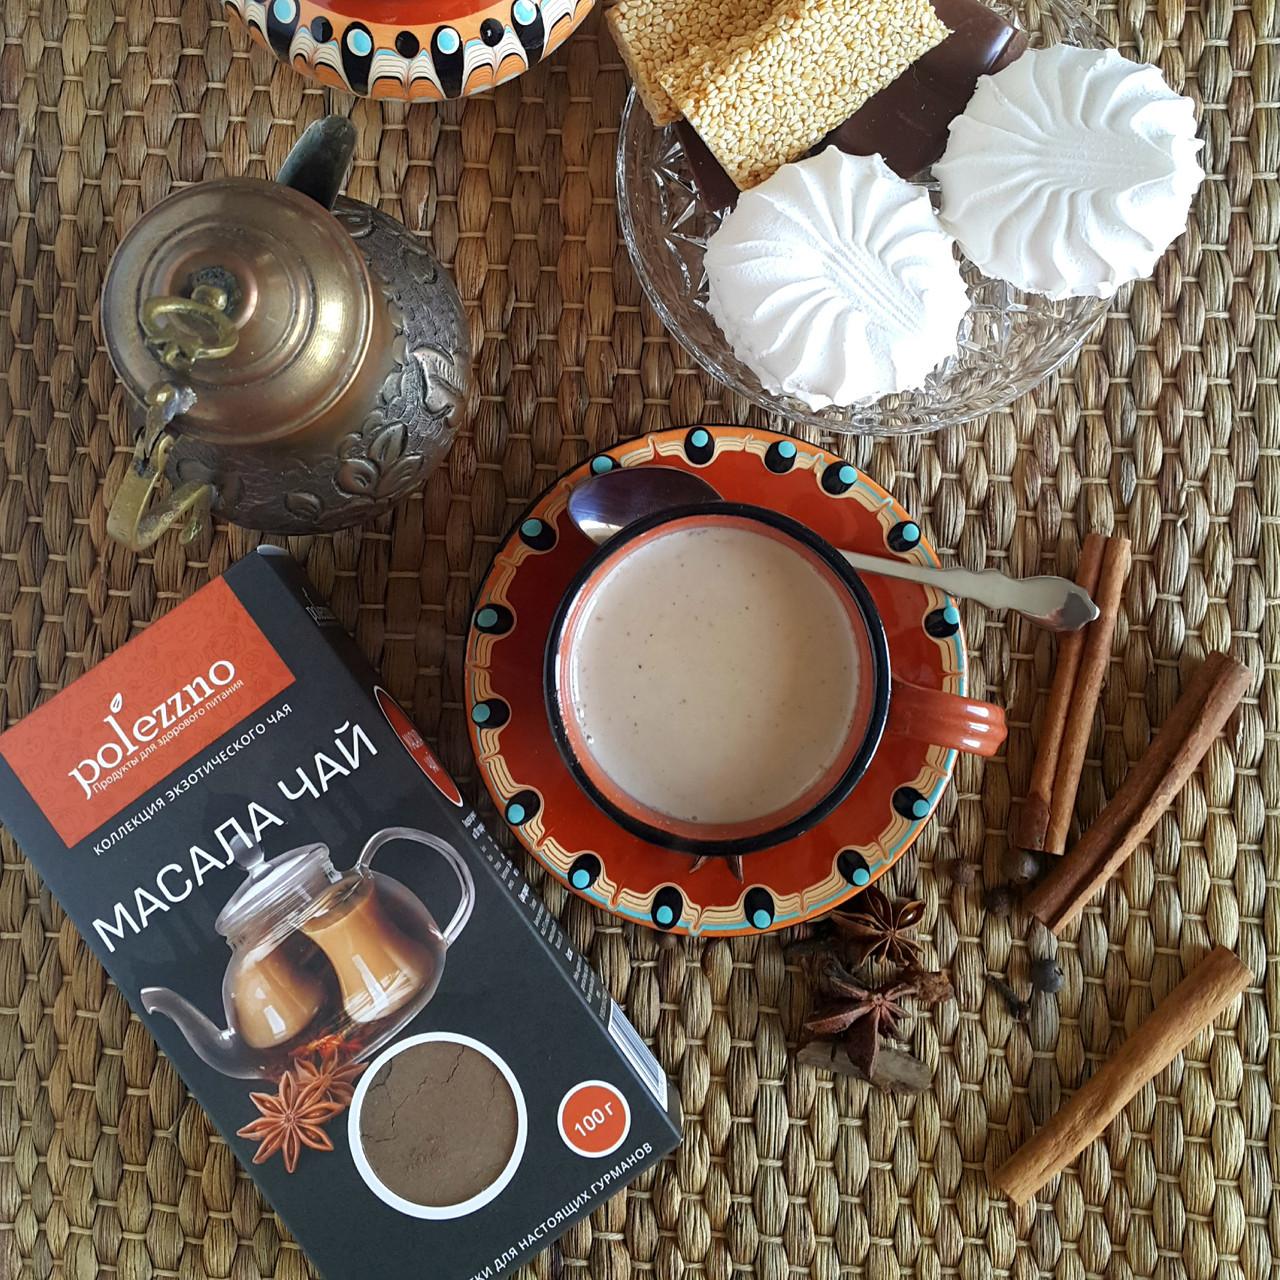 Масала чай (100 гр) Polezzno - фото 3